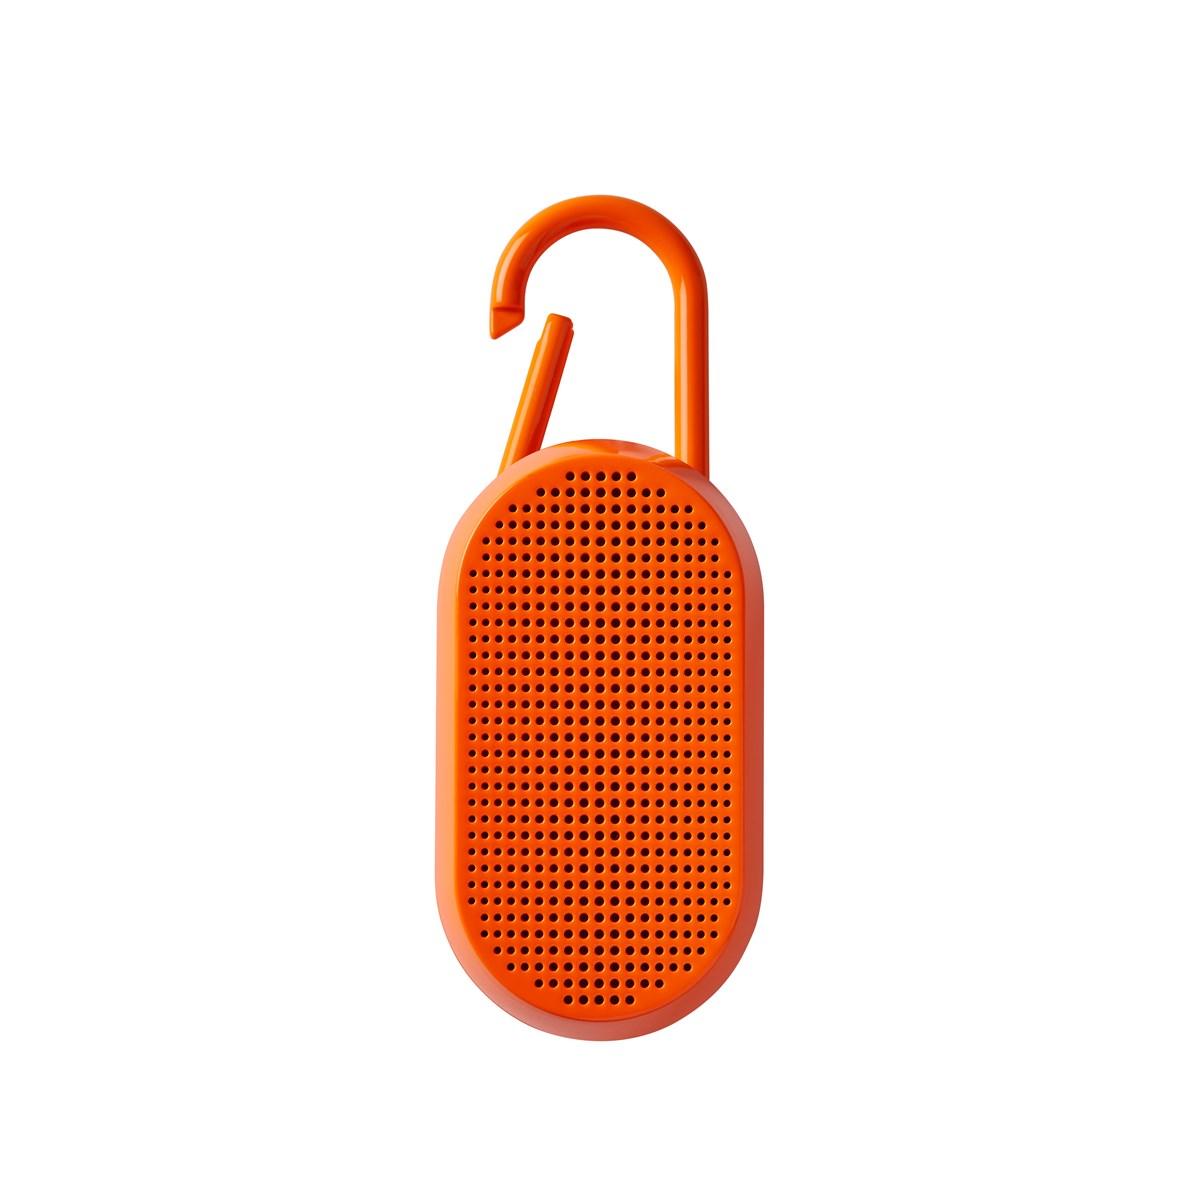 Enceinte bluetooth avec mousqueton en ABS orange